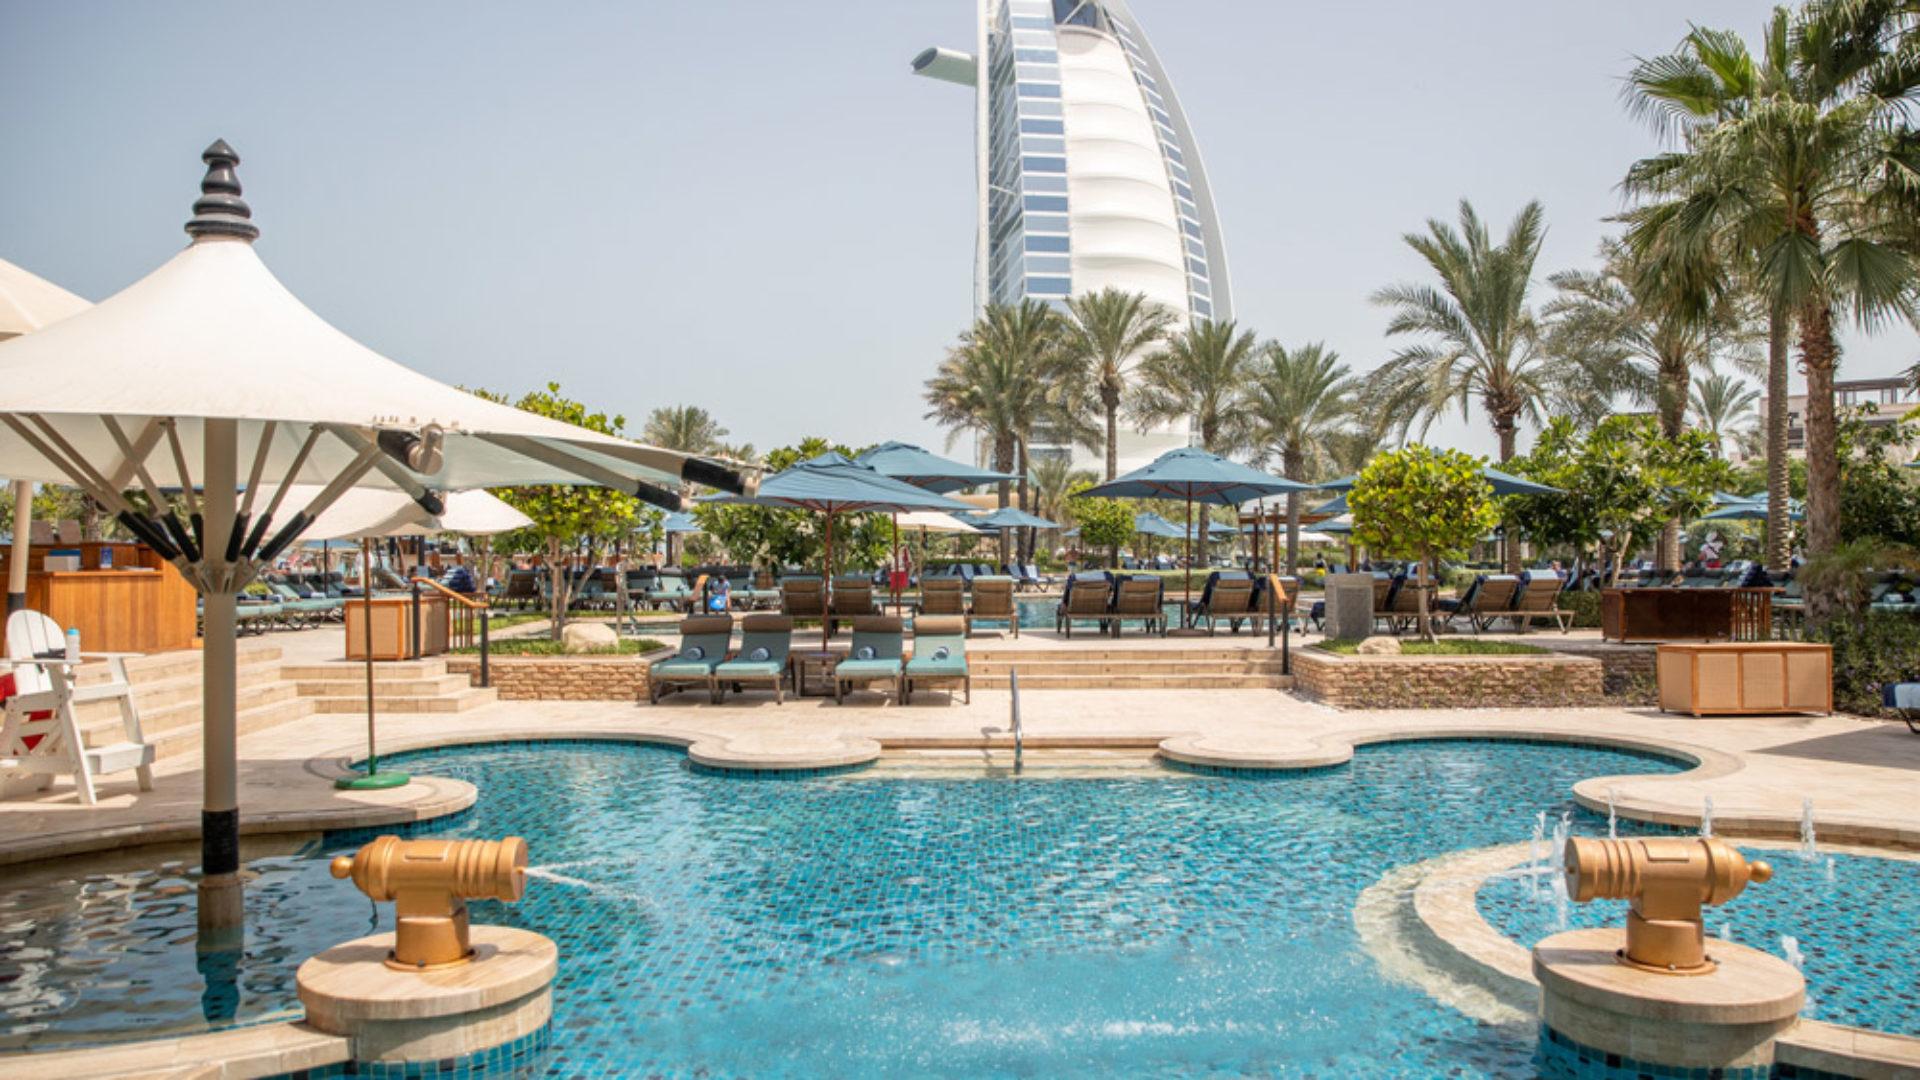 Naseem Kids Pool at the Jumeirah Al Naseem